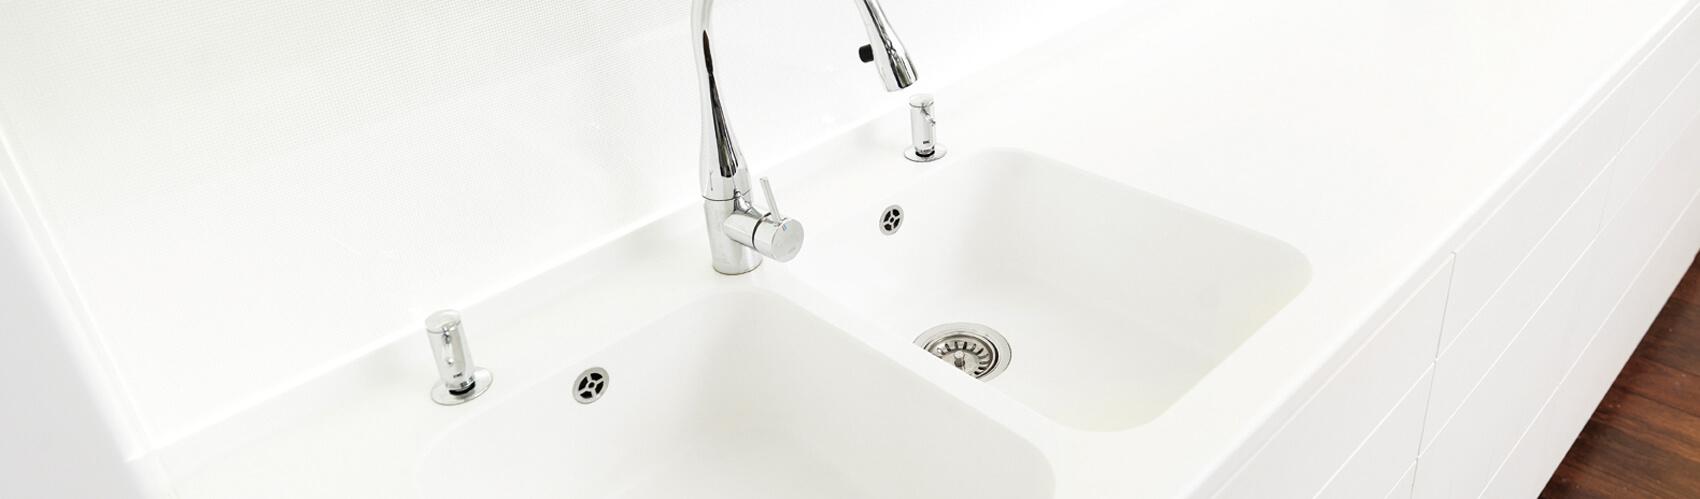 Hi-Macs badkamer – badkamermeubel op maat | Correnti